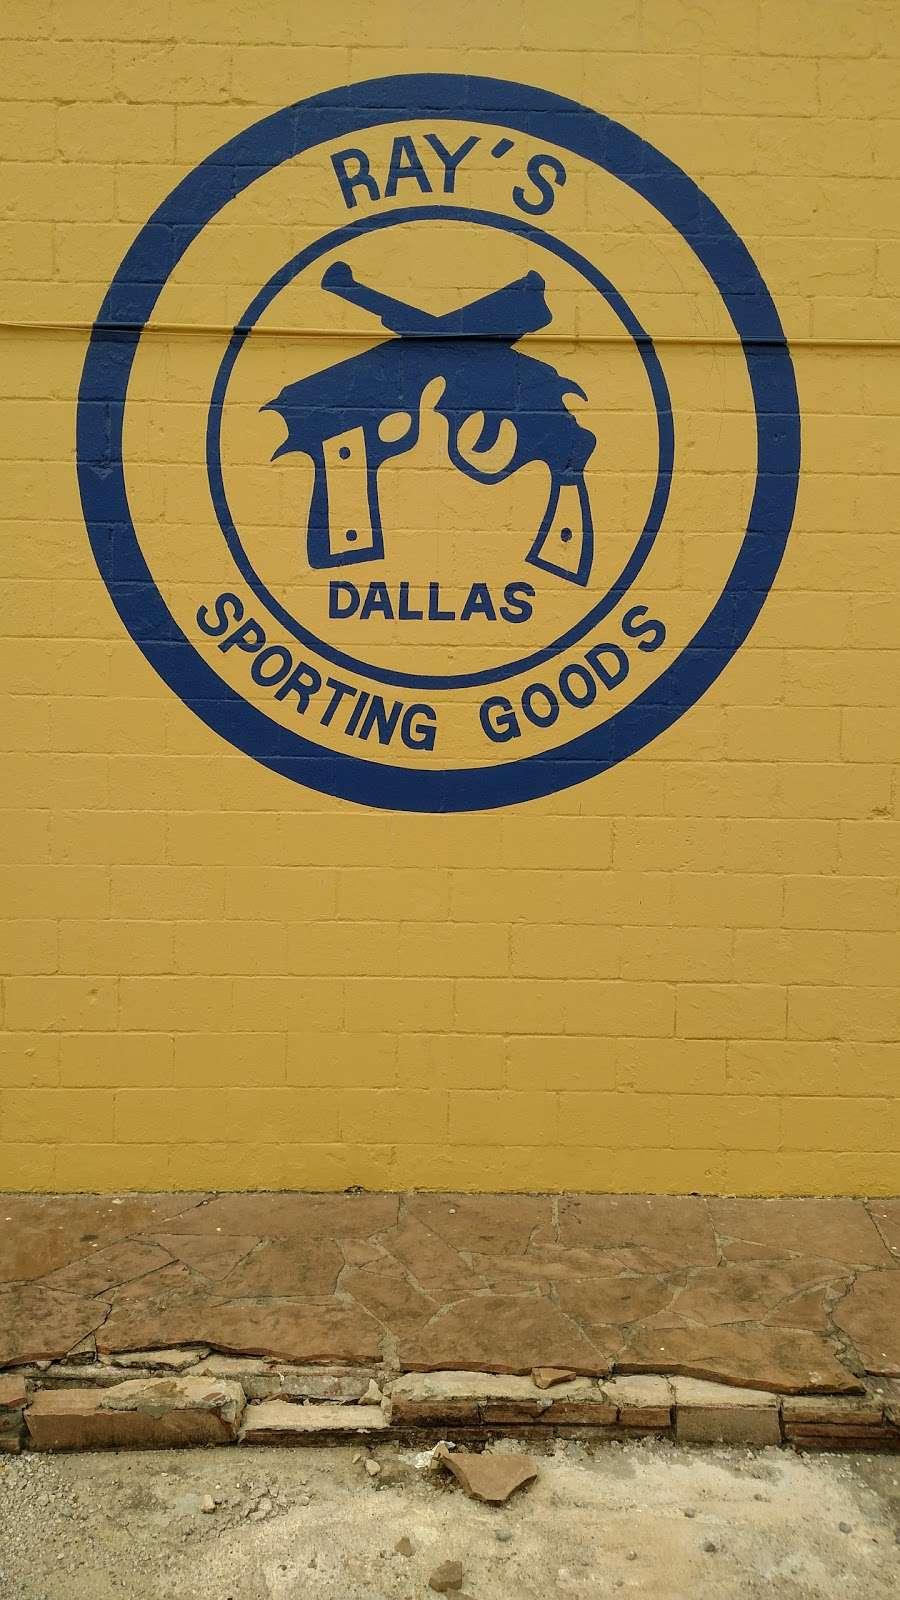 Rays Hardware & Sporting Goods - store    Photo 10 of 10   Address: 730 Singleton Blvd, Dallas, TX 75212, USA   Phone: (214) 747-7916